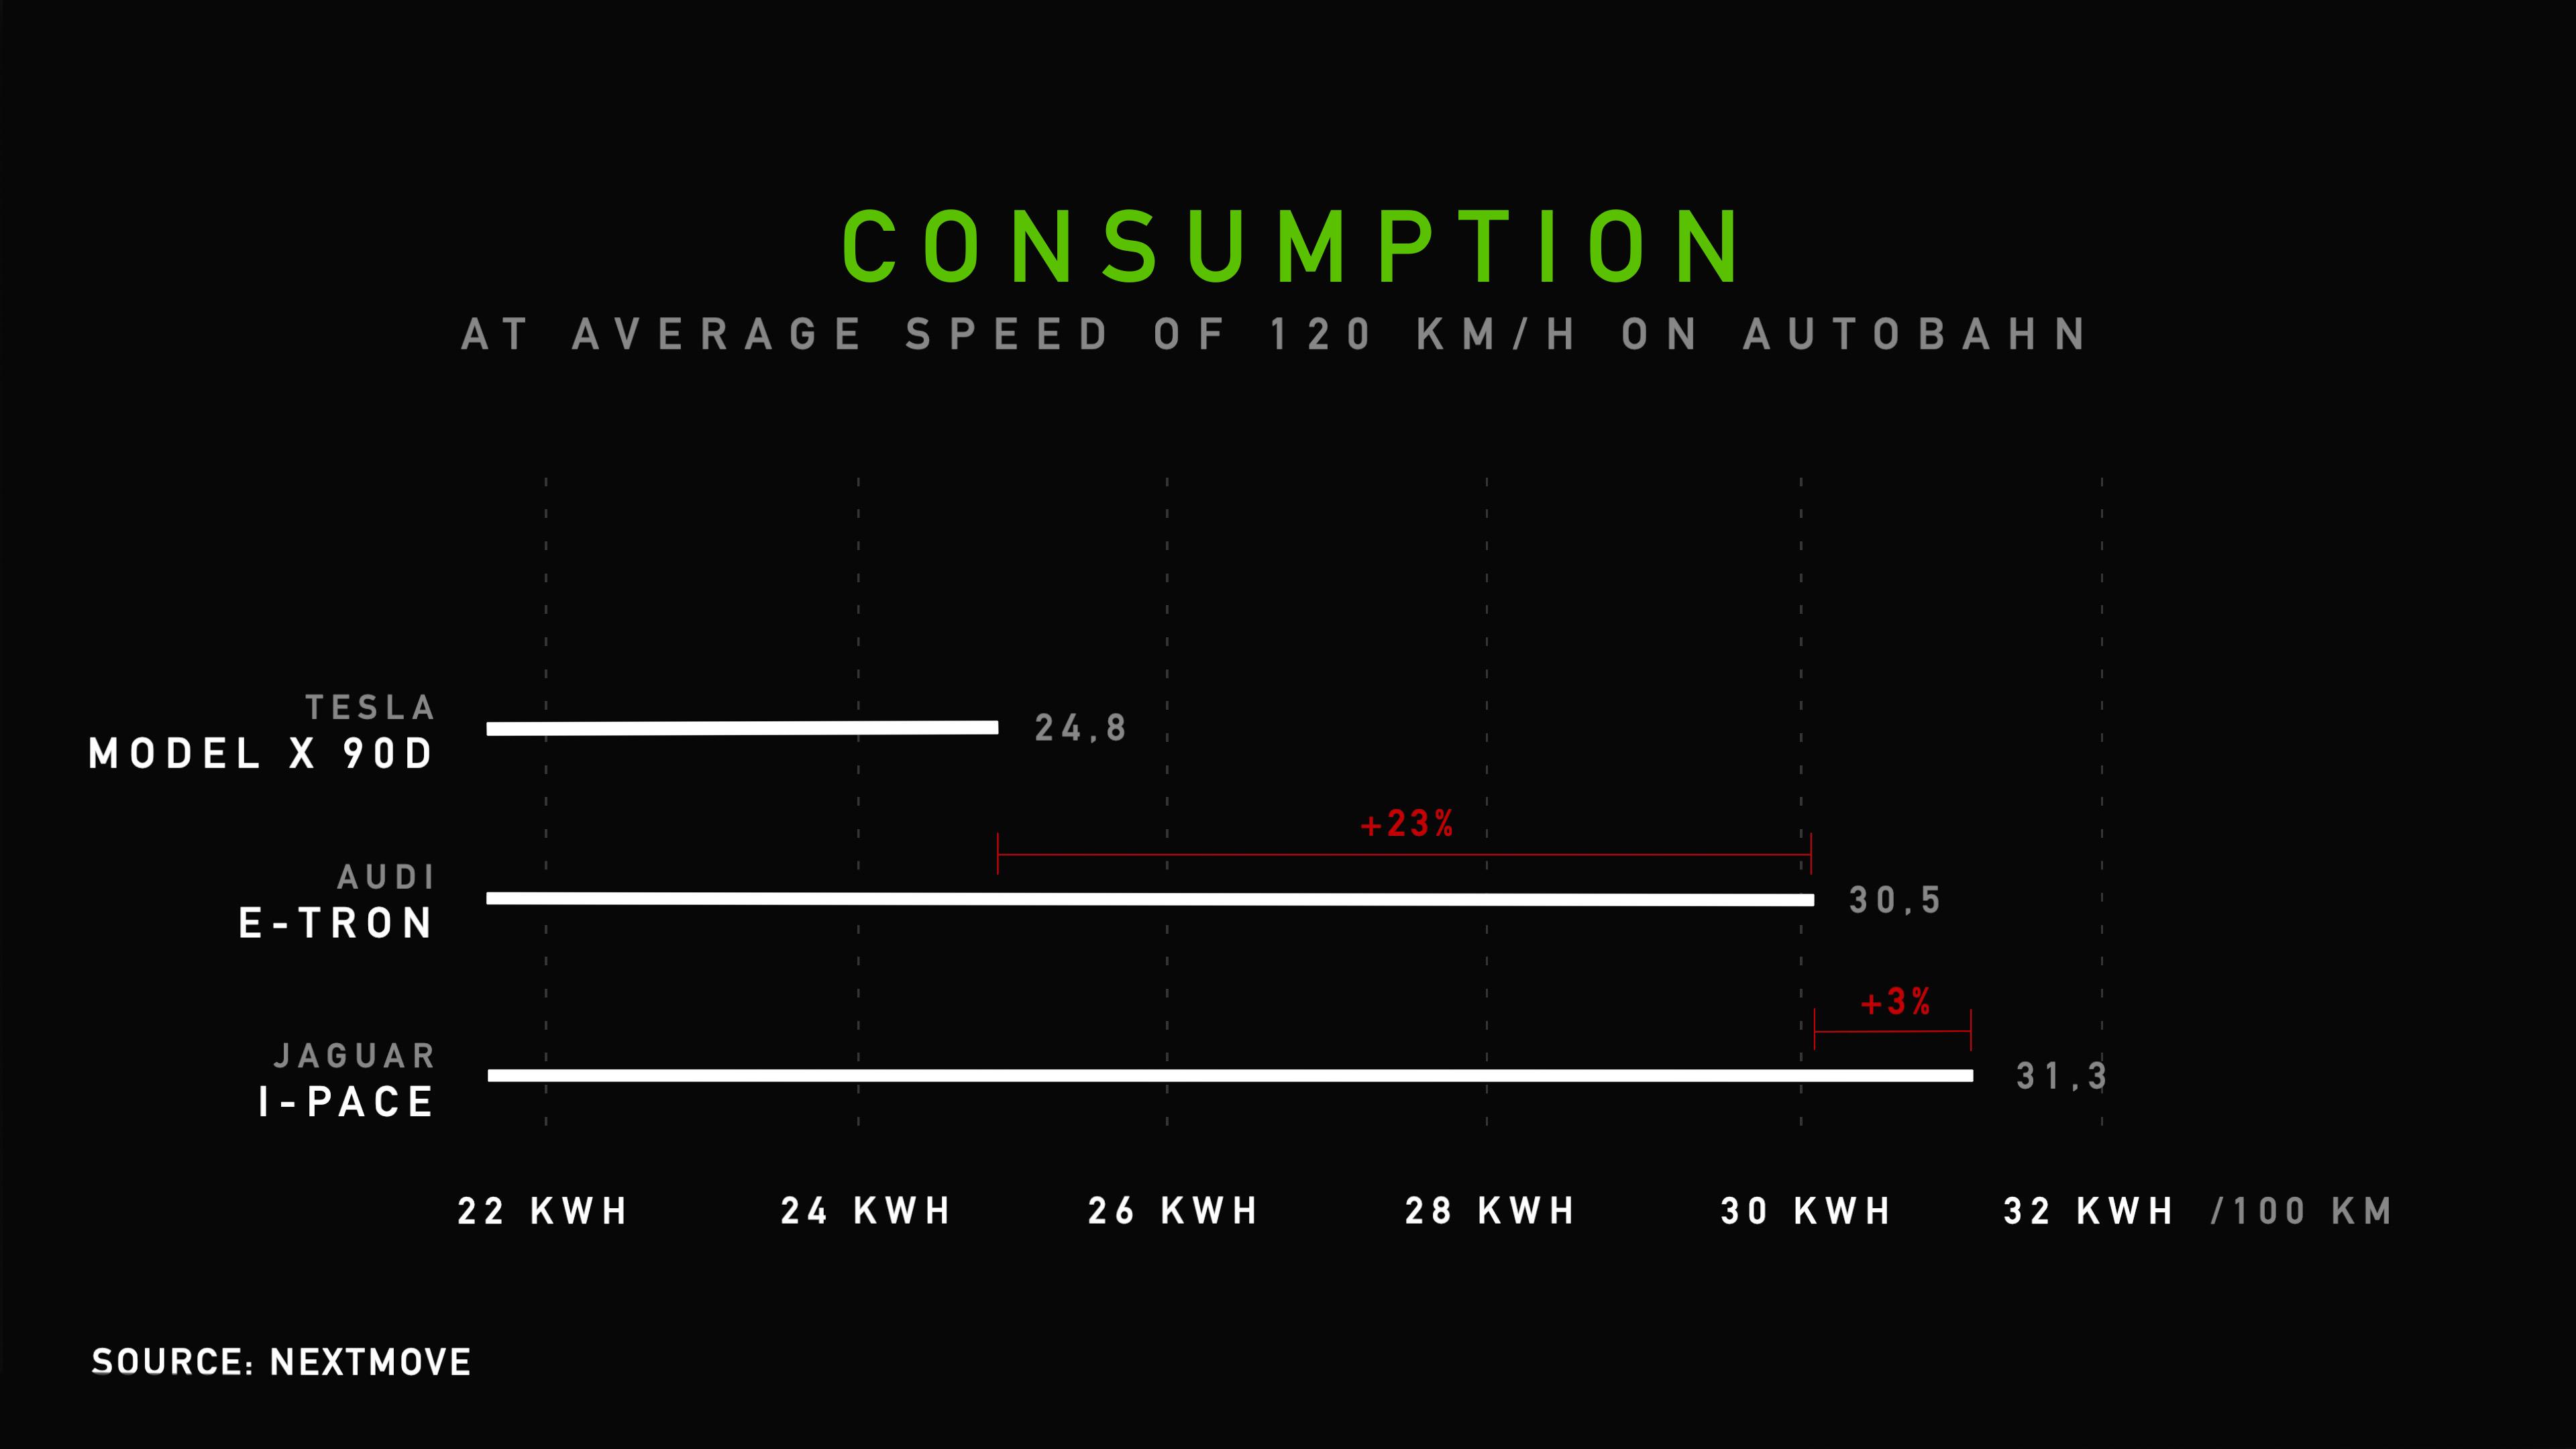 Audi etron, Tesla Model X, Jaguar I-PACE Range Consumption Test - Average Speed 120 km/h